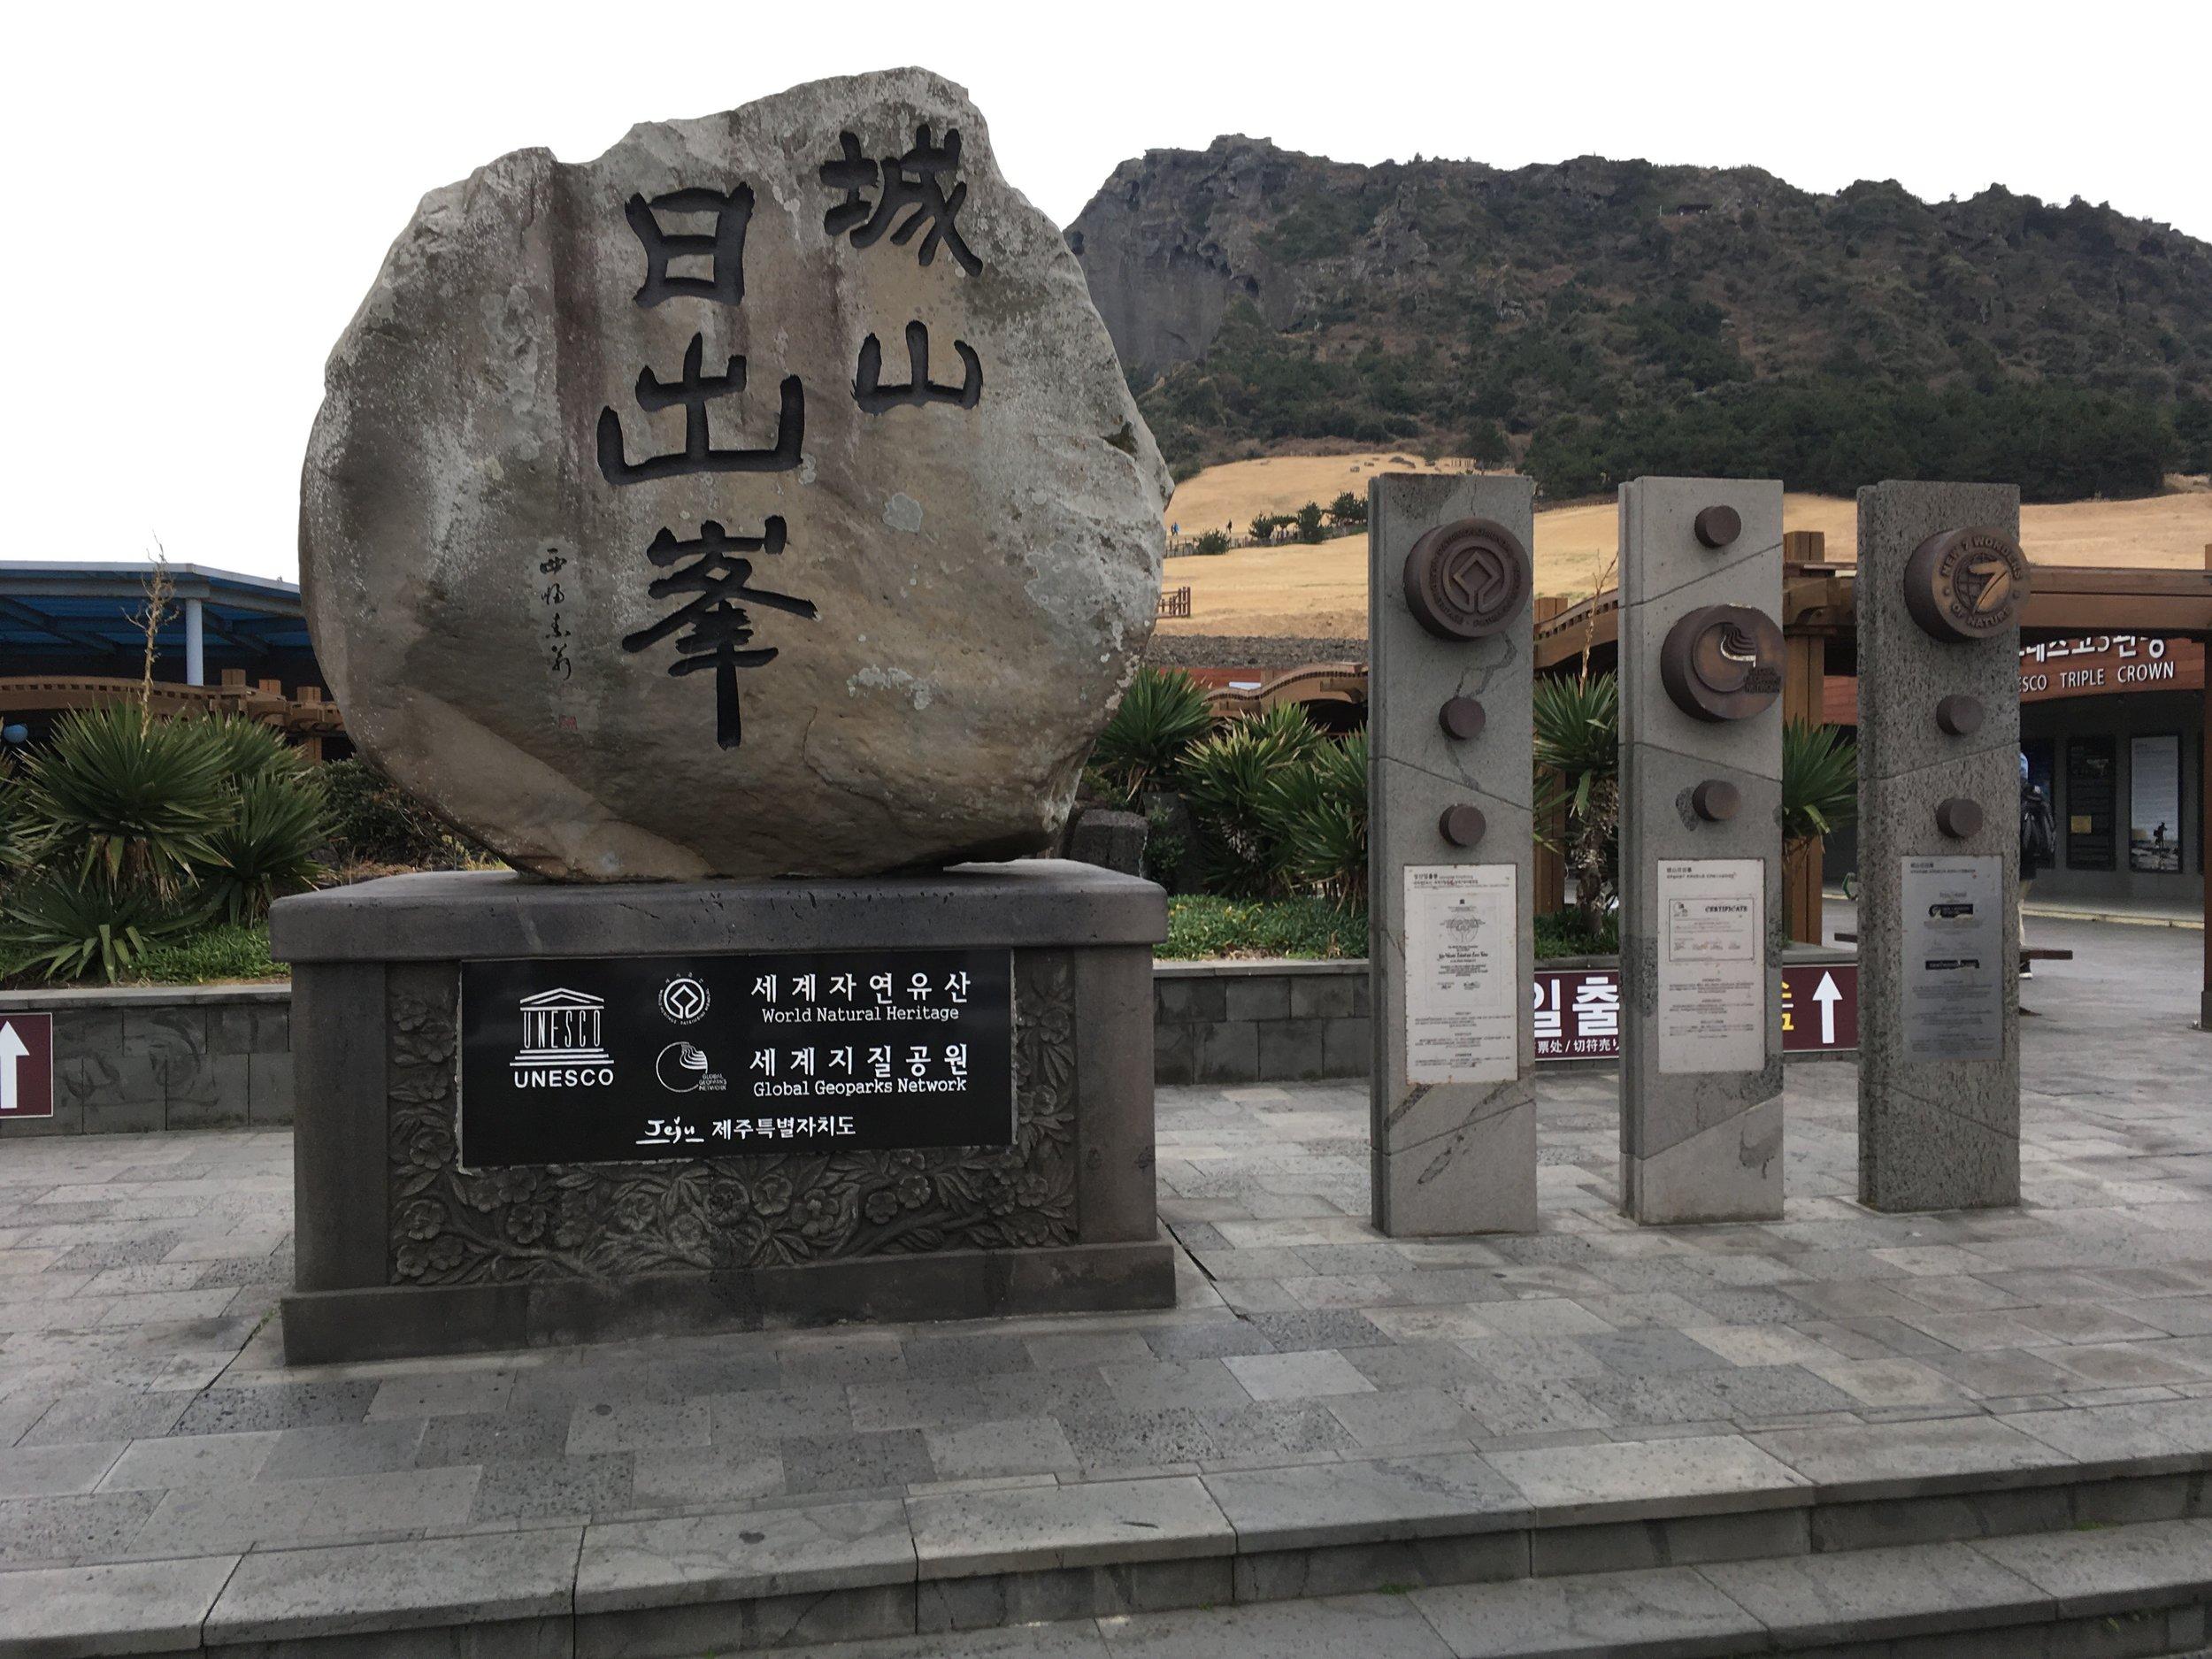 Seongsan Ilchubong is World Heritage listed